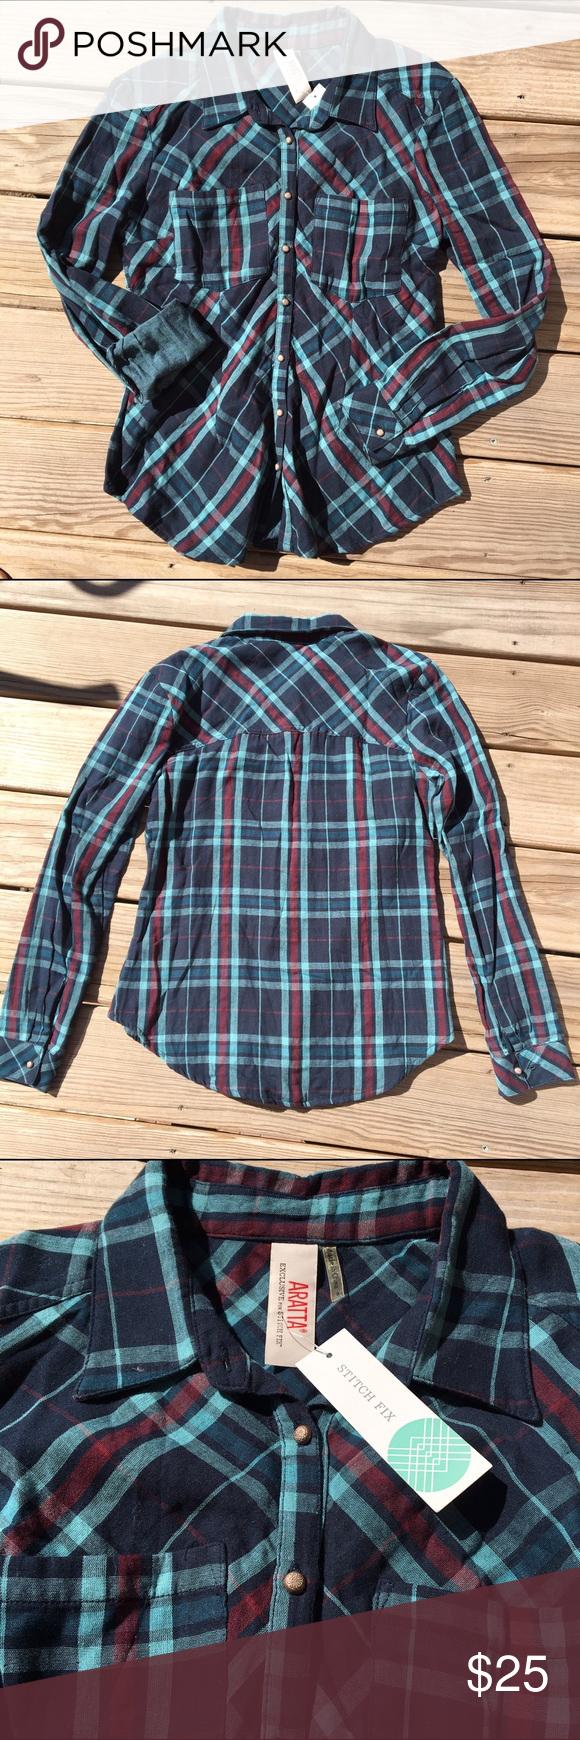 Navy blue flannel shirt womens  Womenus Cut Flannel NWT  Flannels Plaid and Navy